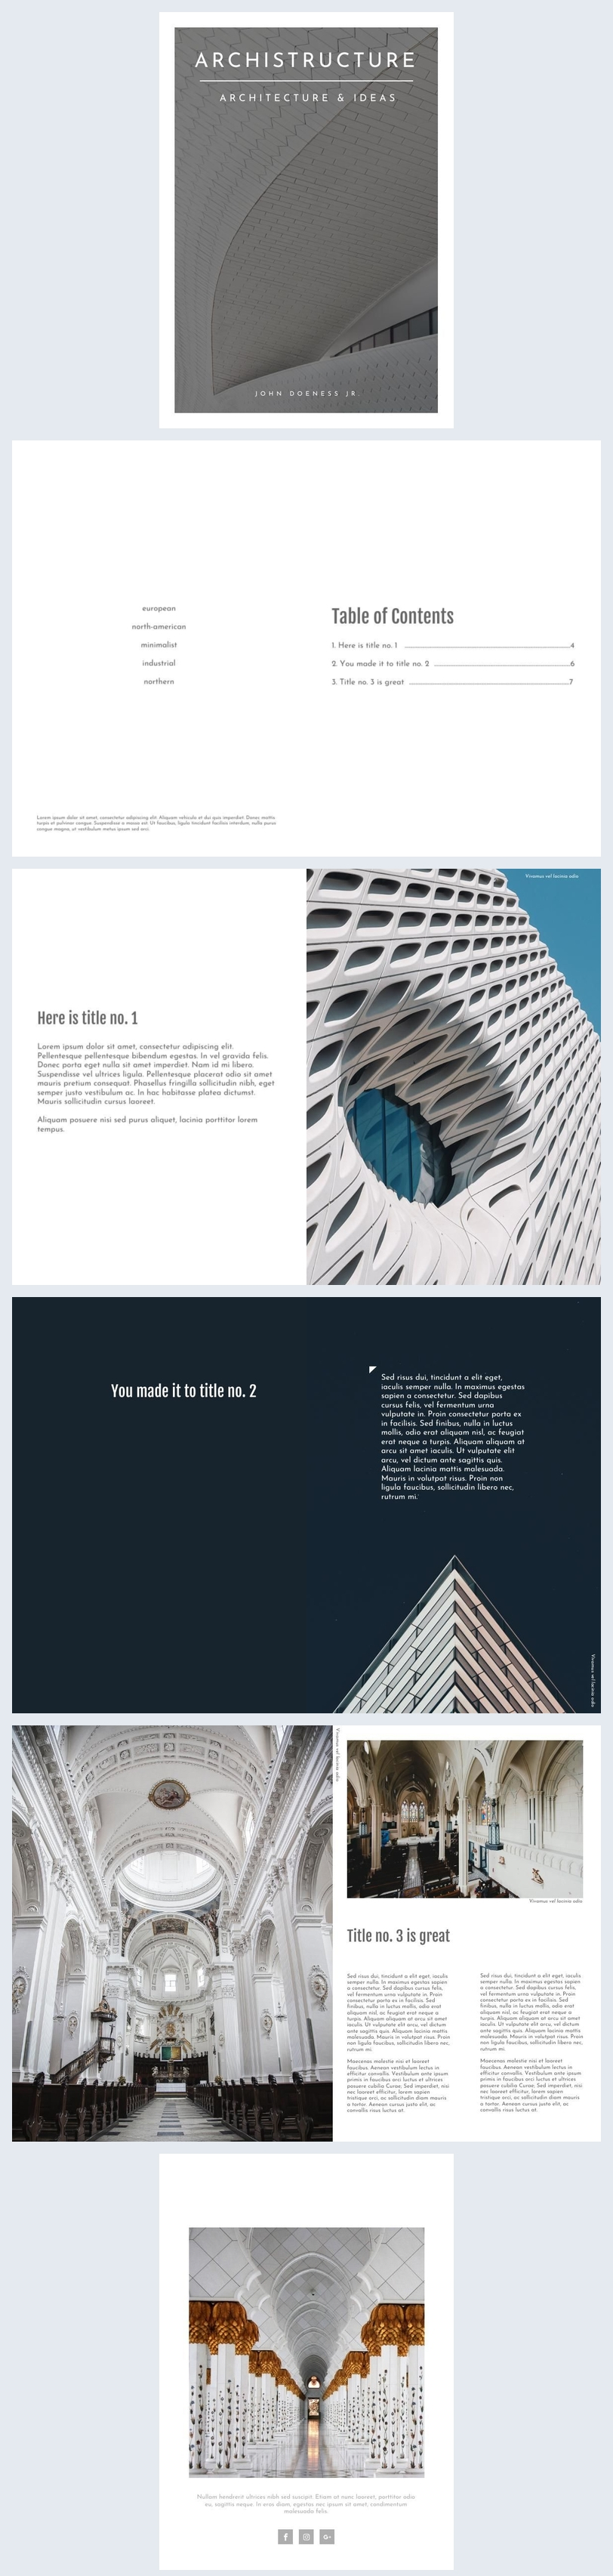 Diseño para portafolio profesional de arquitectura